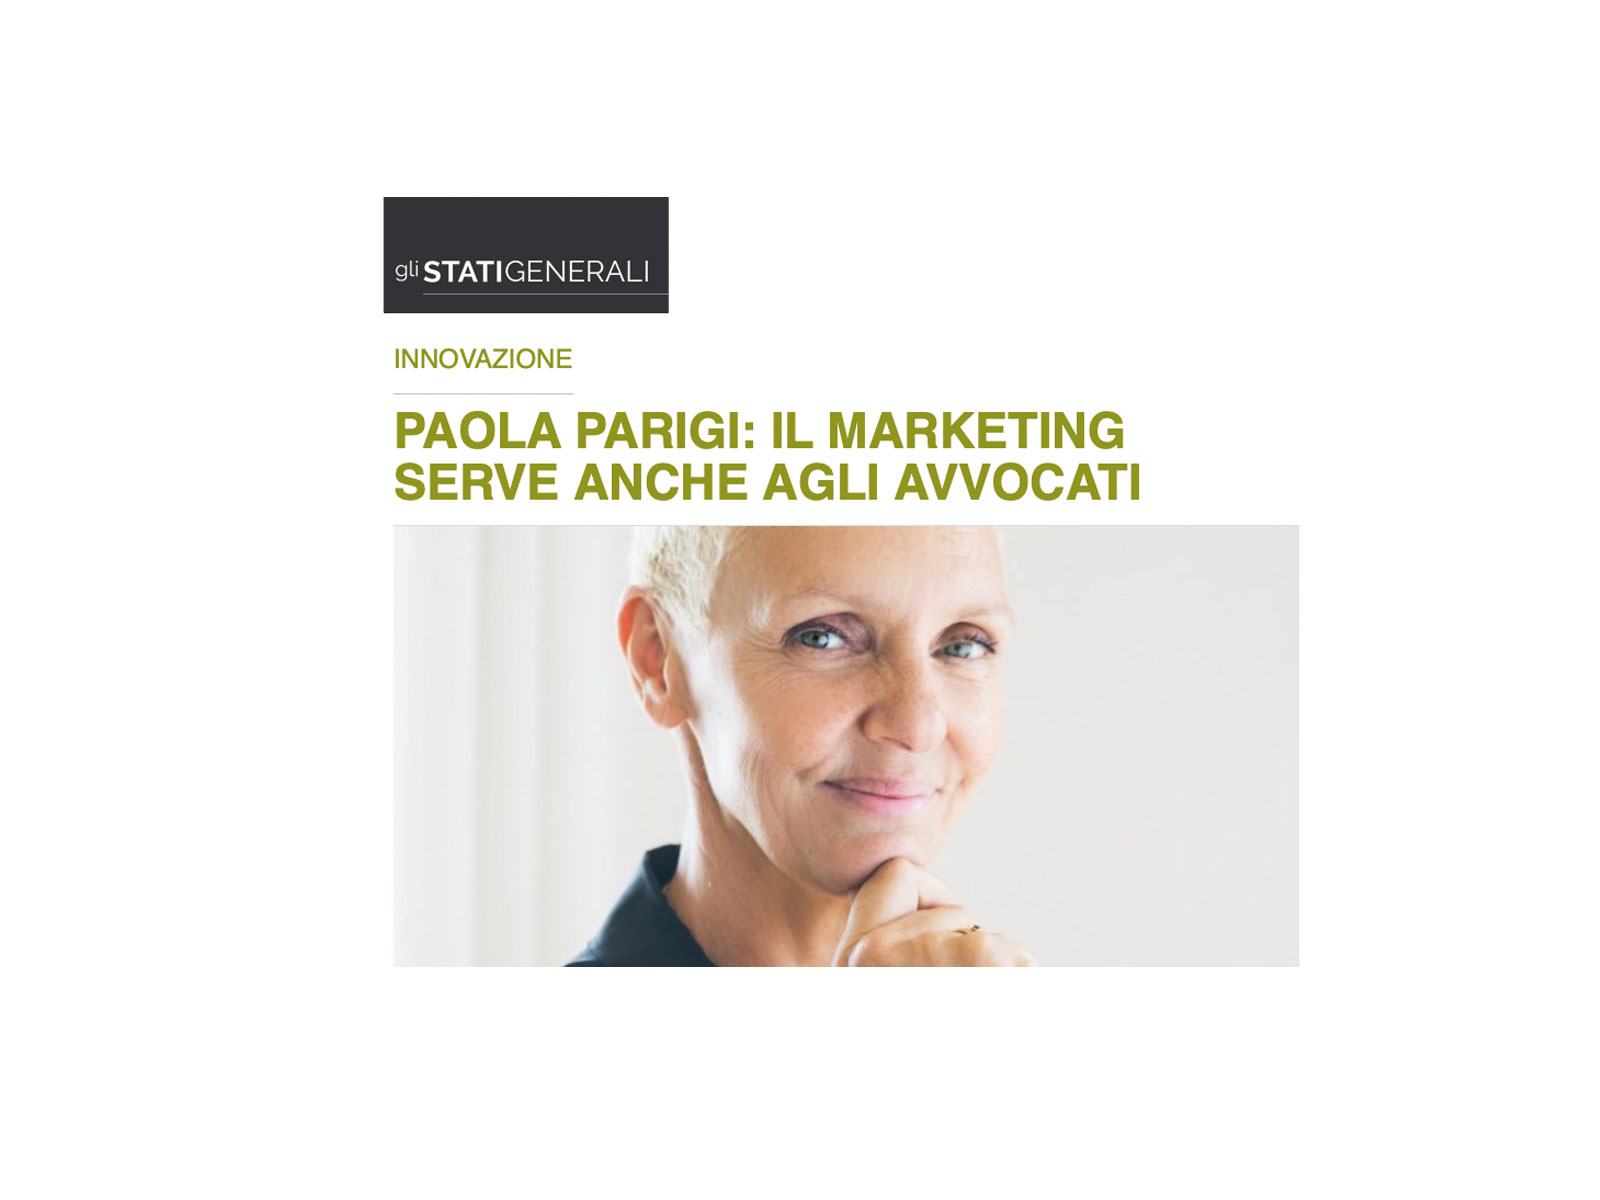 intervista-a-paola-parigi